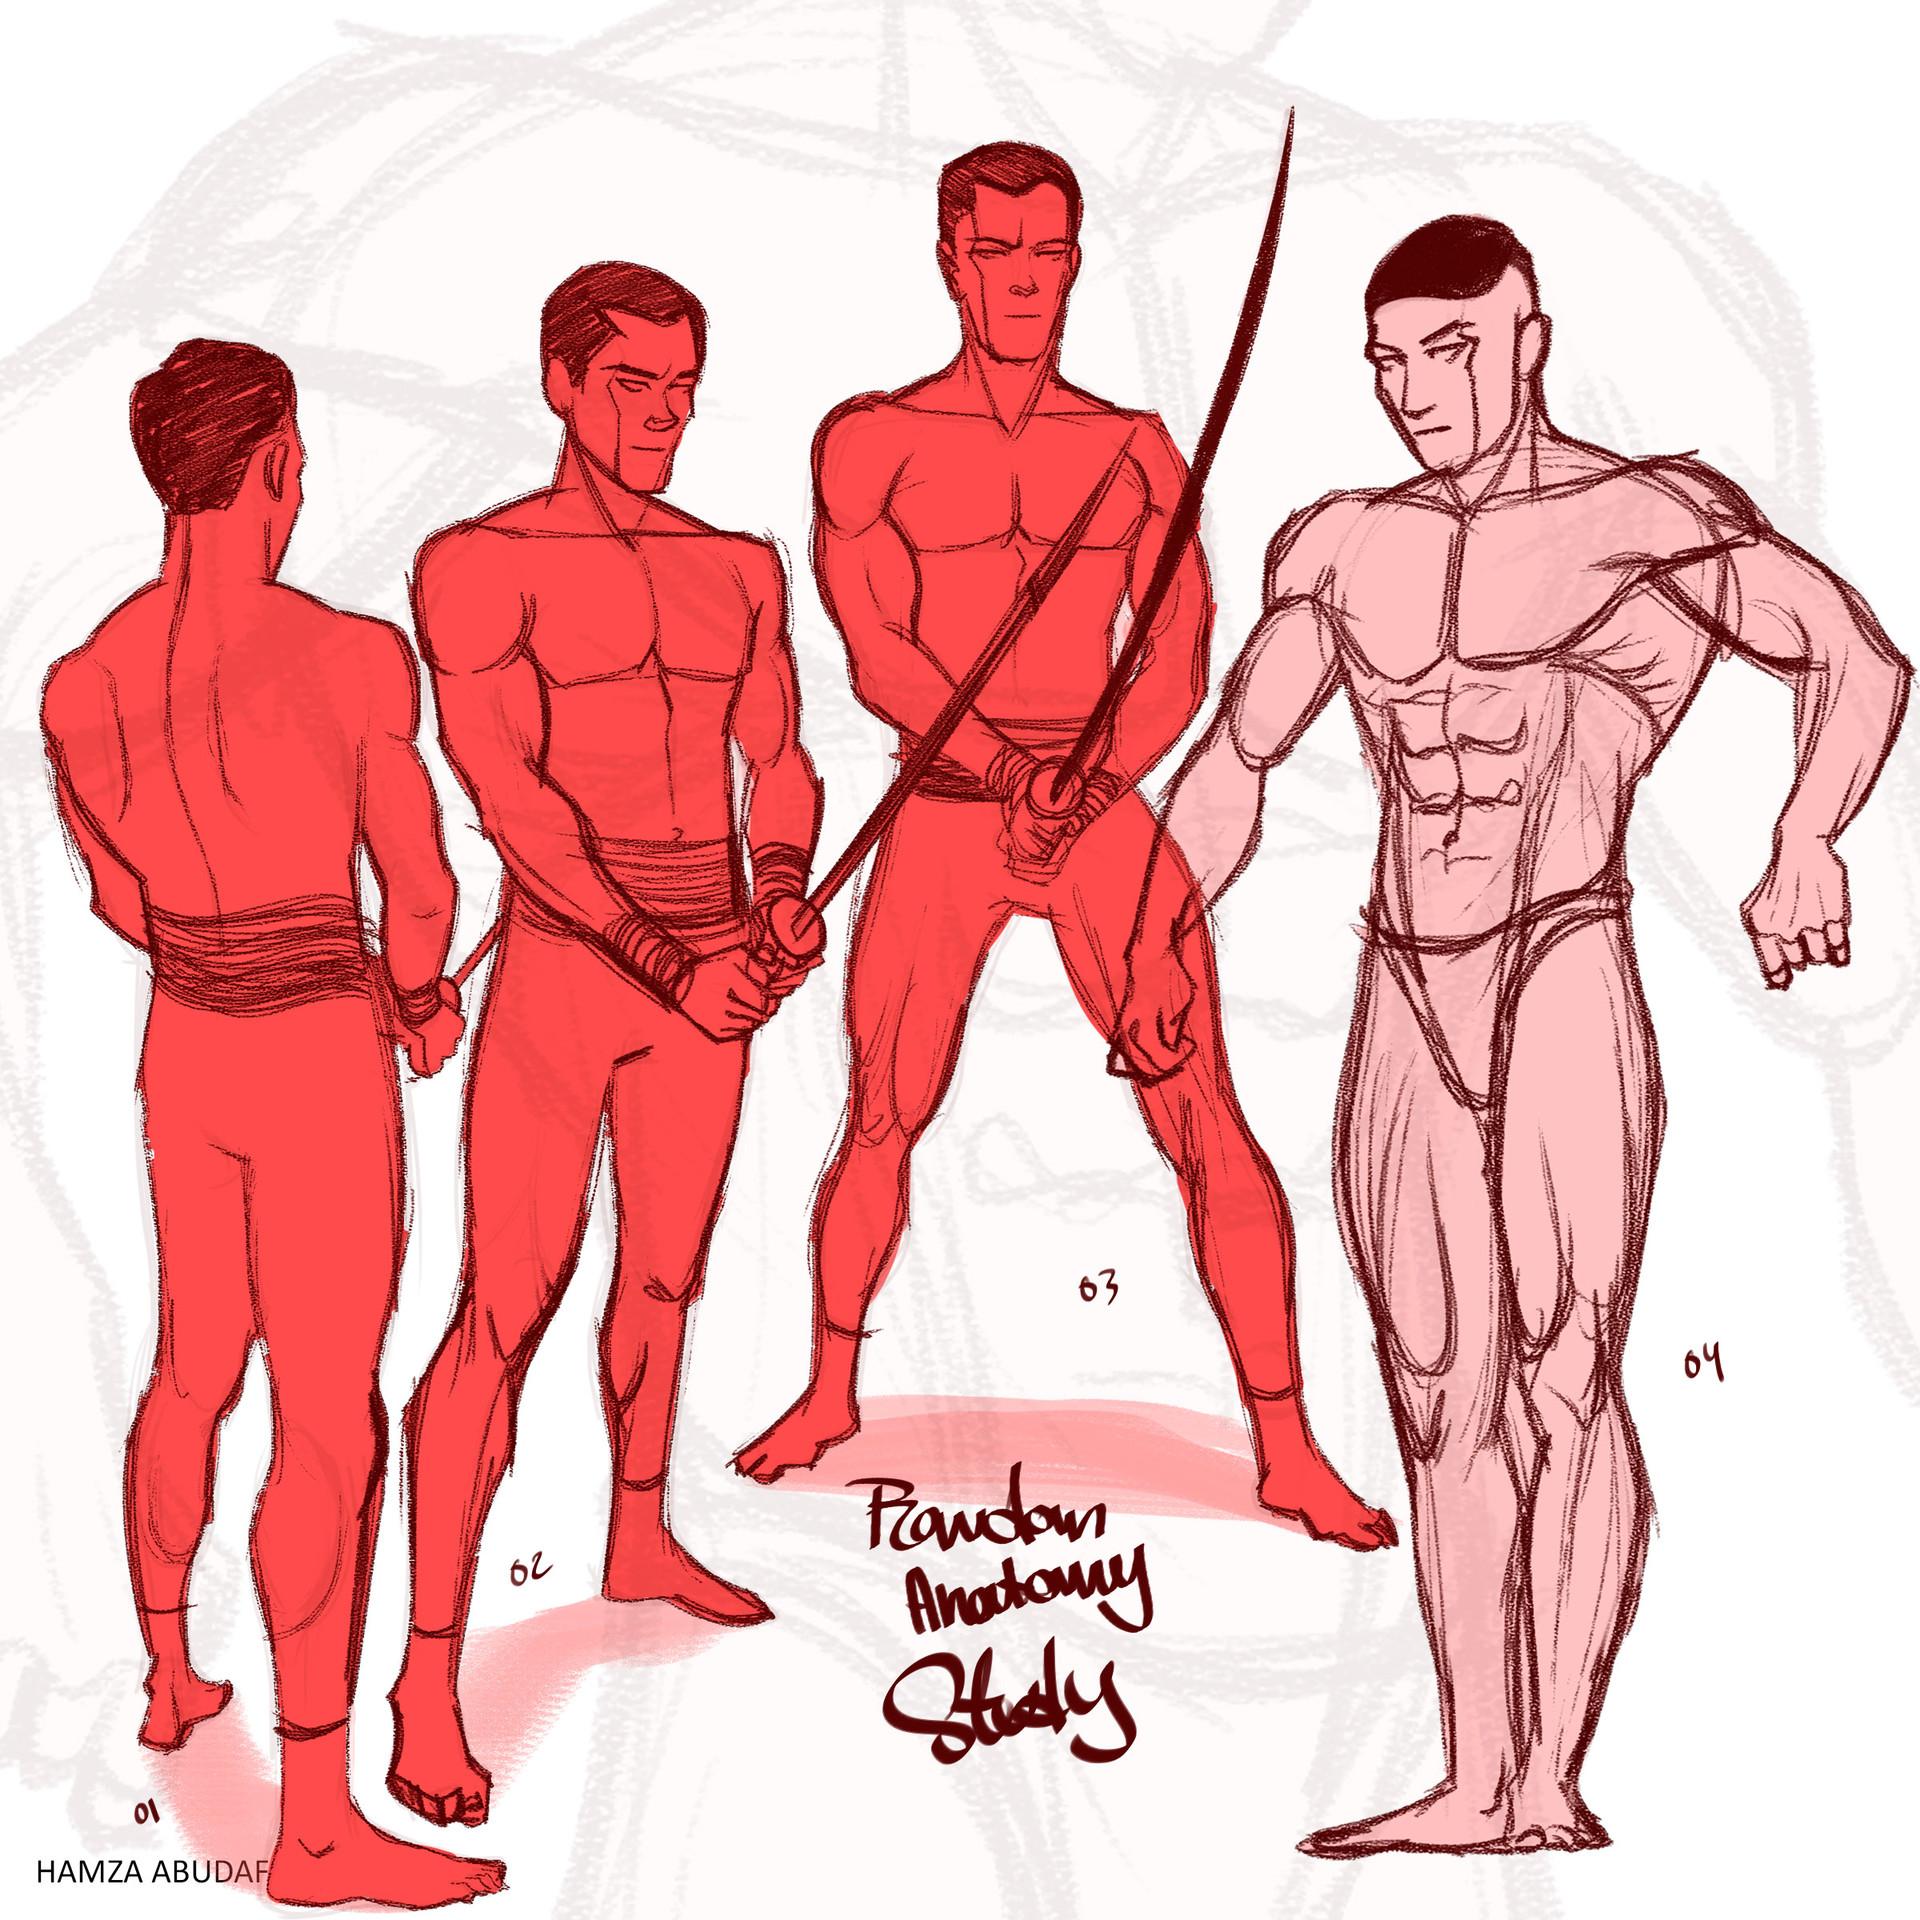 Hamza Abudaff Poses Anatomy Studies 01